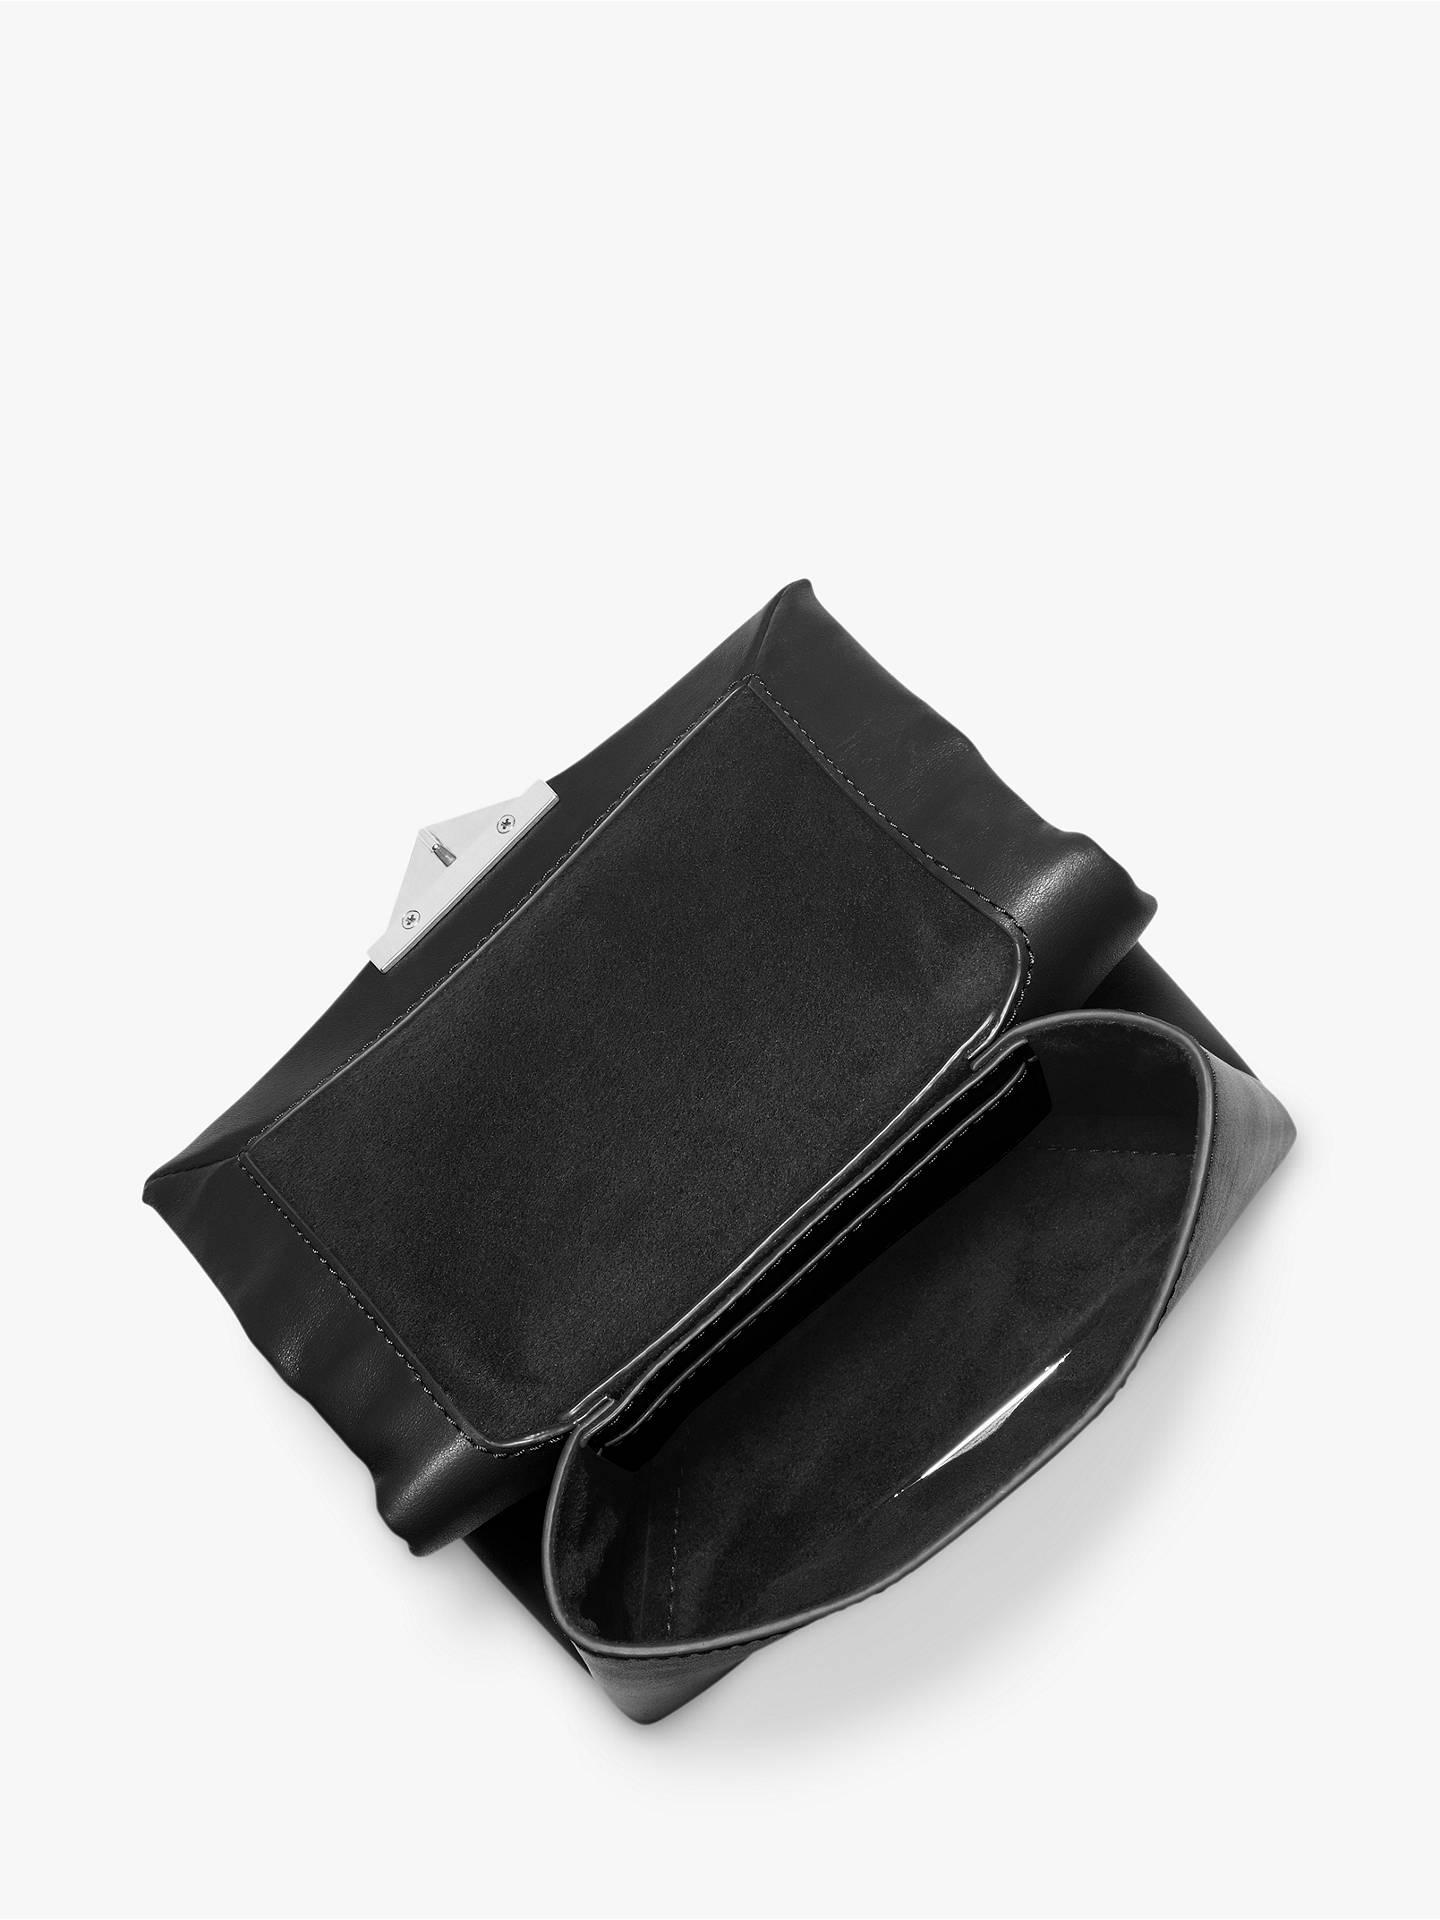 b5da883242b5 Buy MICHAEL Michael Kors Cece Small Chain Cross Body Bag, Black Online at  johnlewis.